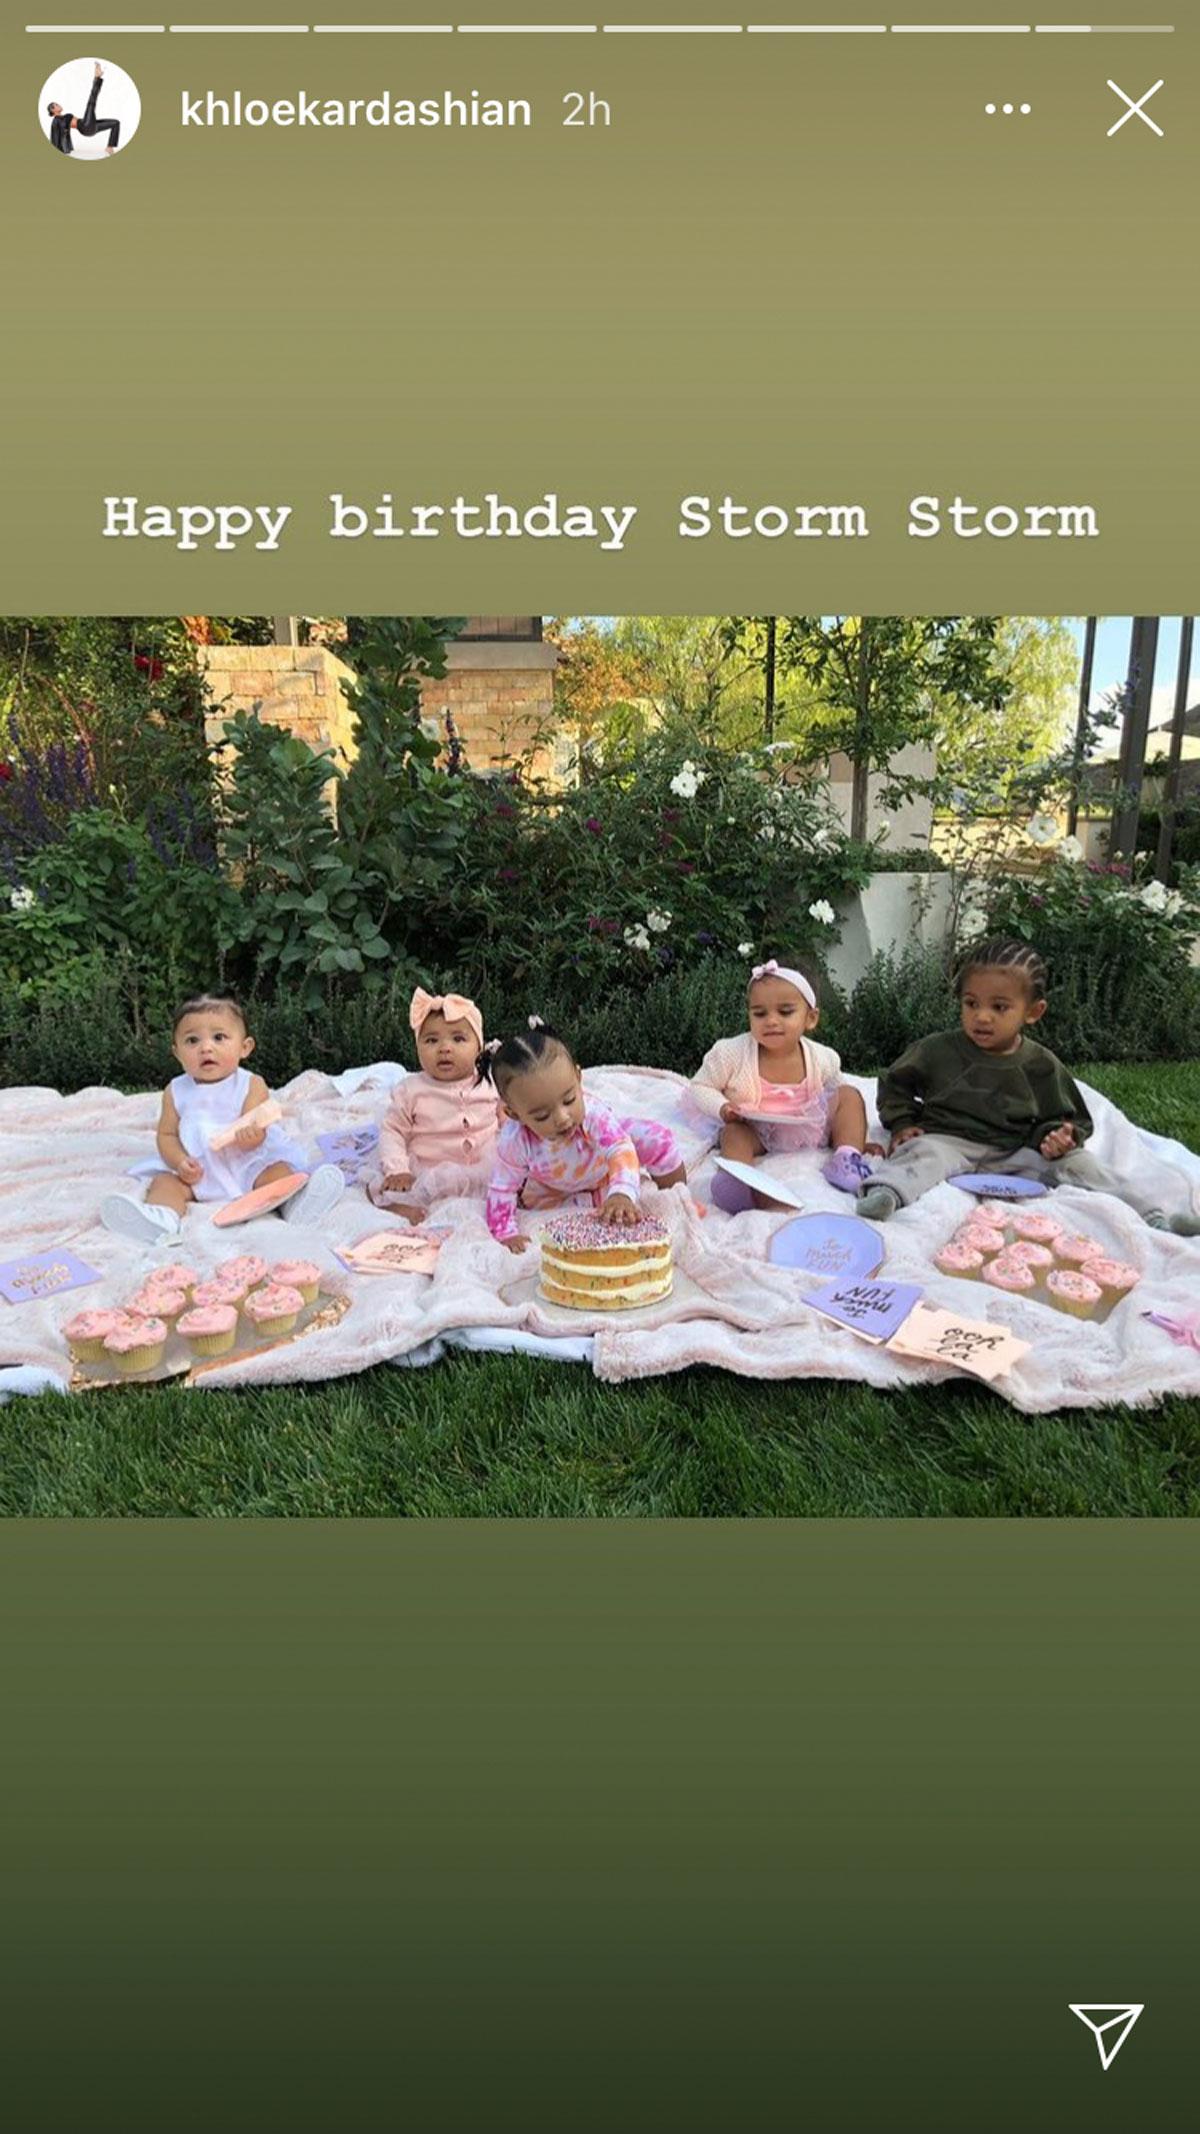 Khloe Kardashian wishes Stormi Webster a happy birthday!